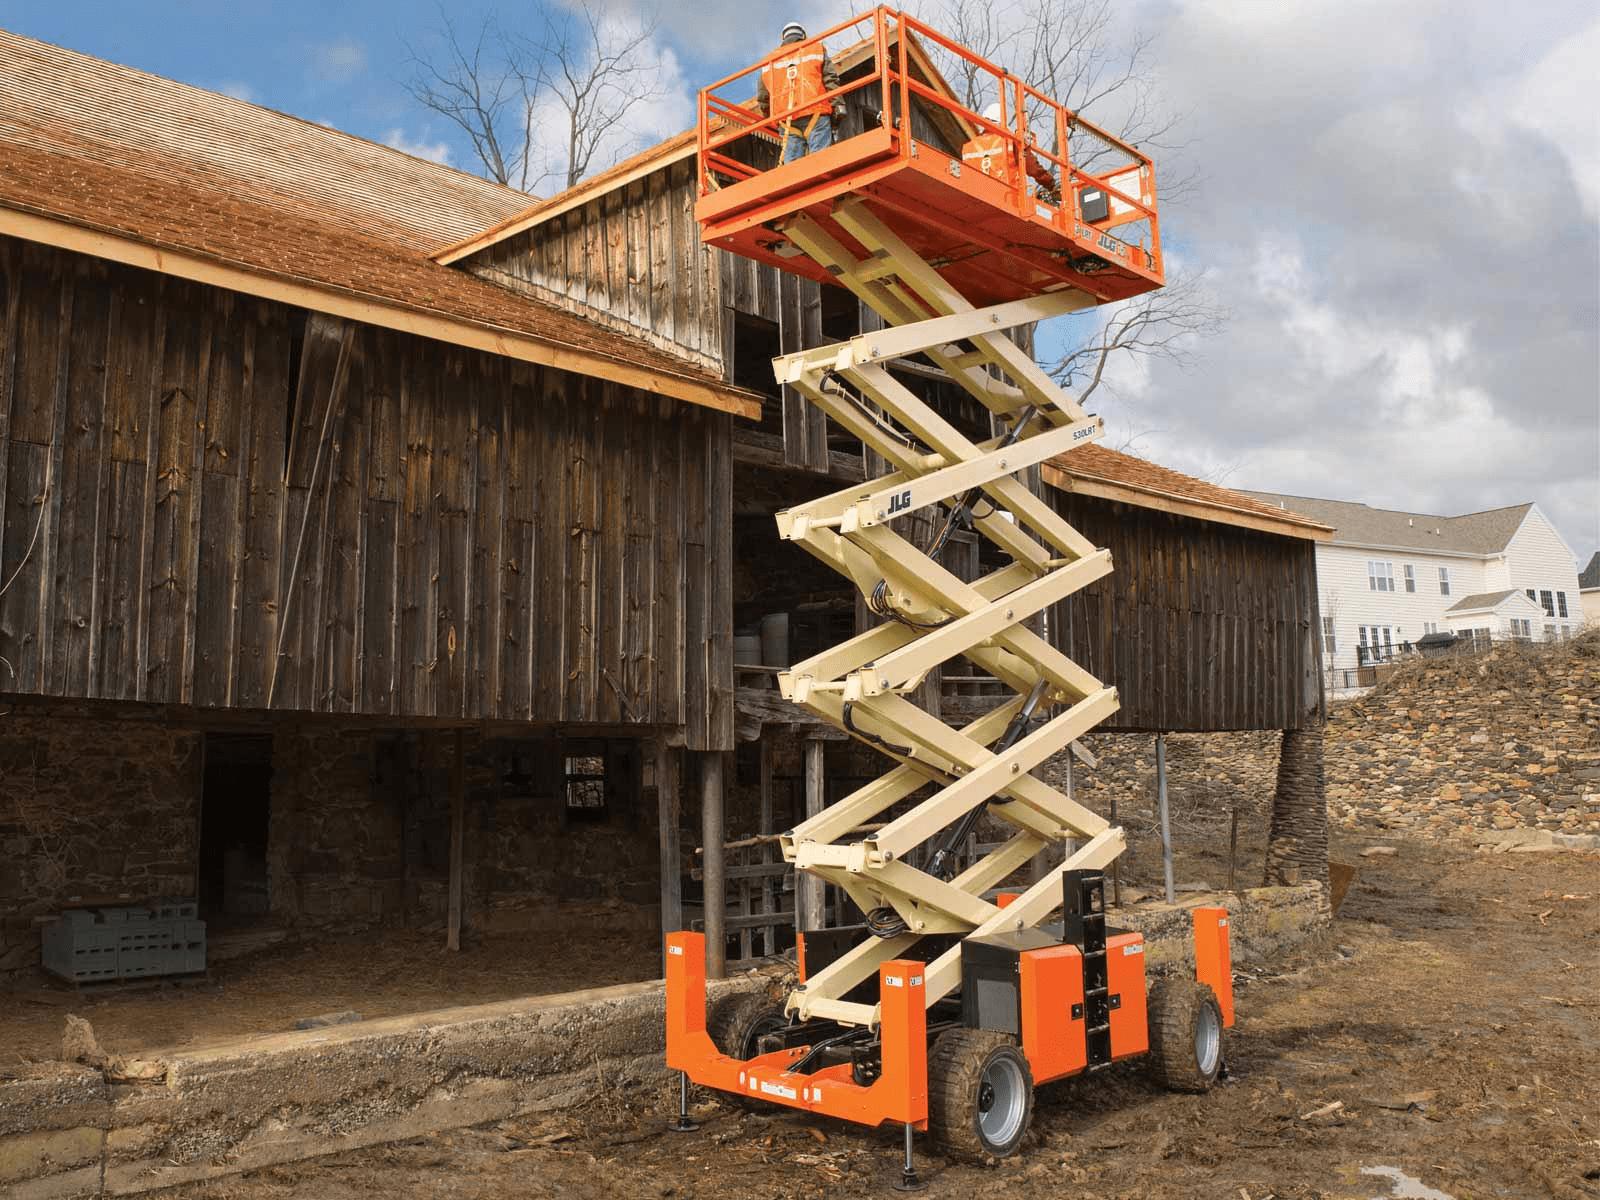 hight resolution of jlg 530lrt rough terrain scissor lift